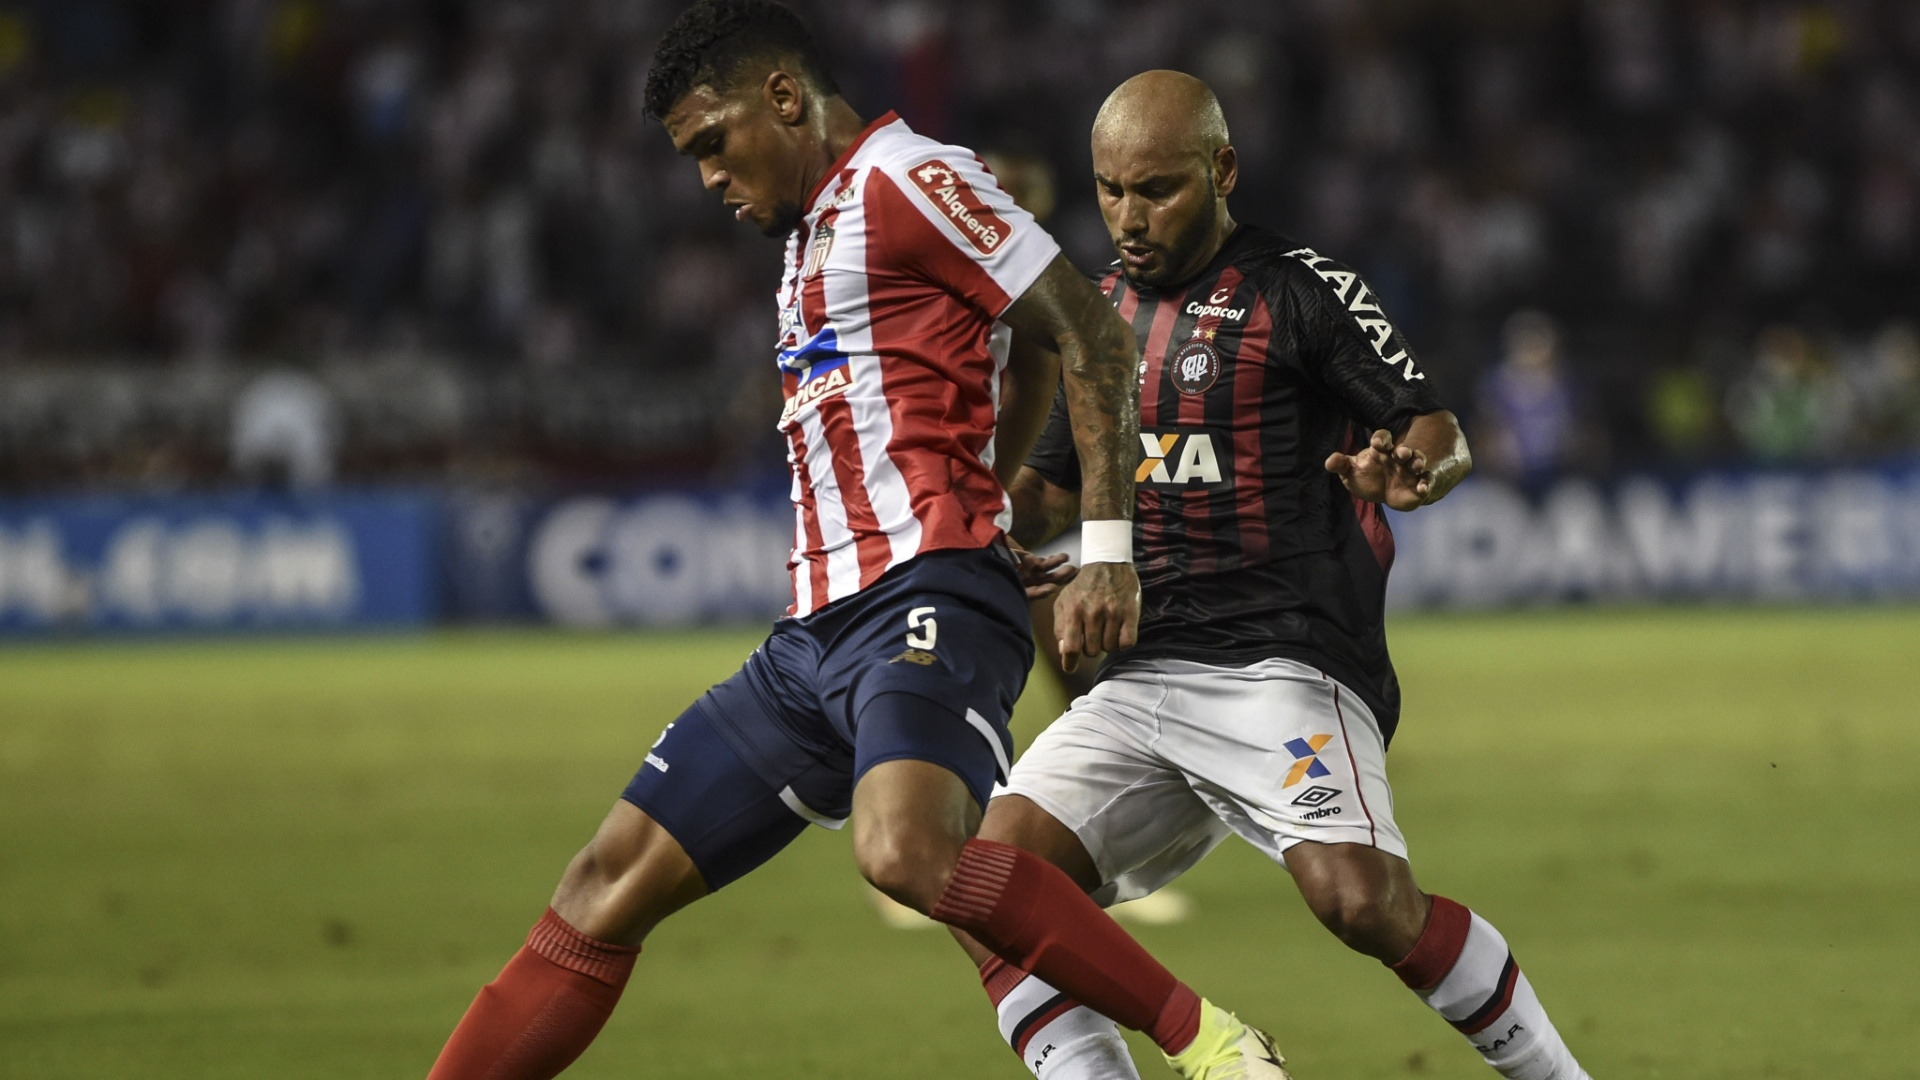 Jonathan, durante partida entre Junior de Barranquilla e Atlético-PR